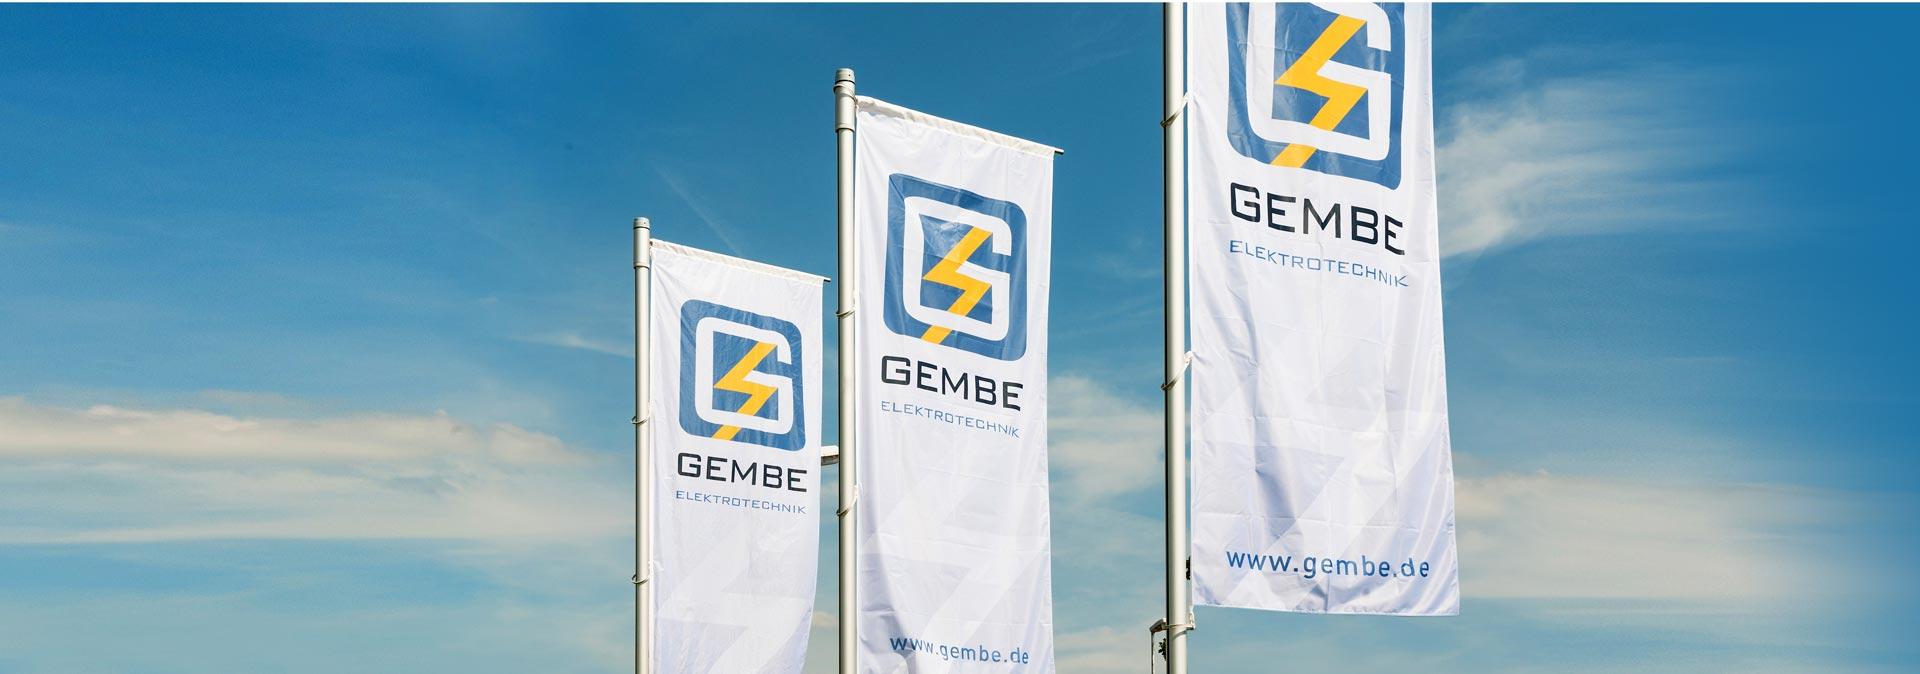 GEMBE Elektrotechnik Fahnen10_06_16